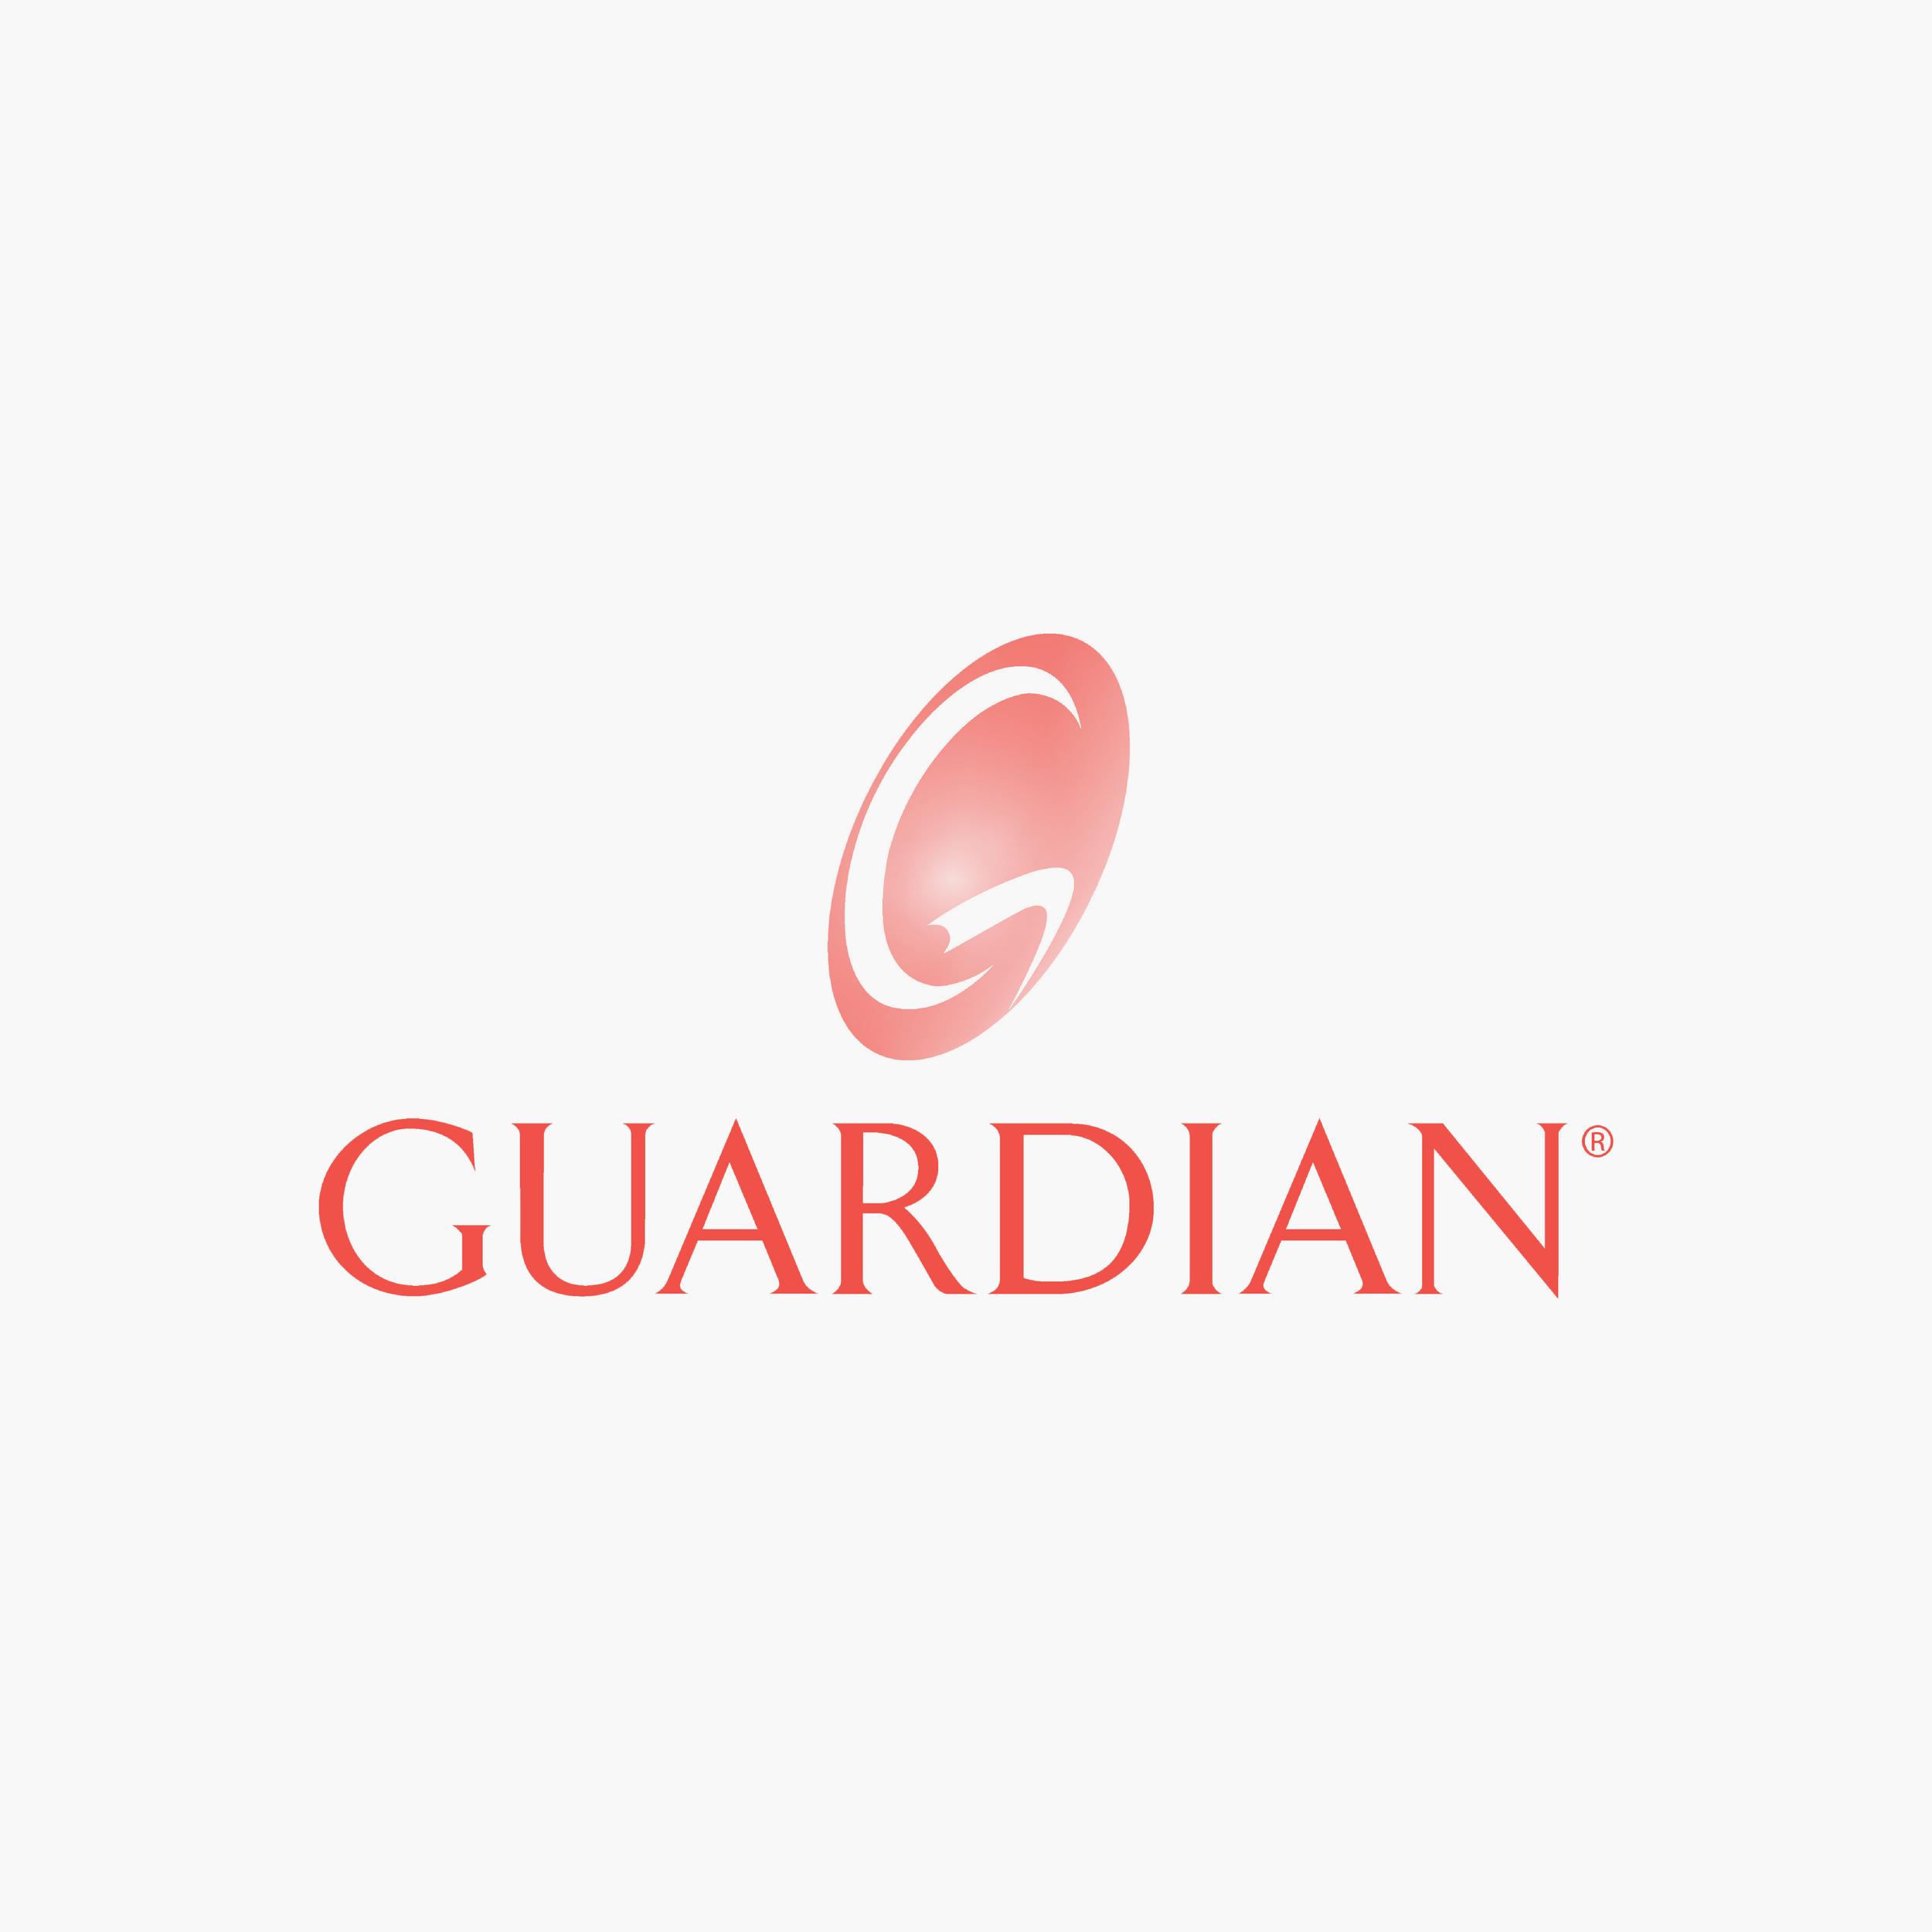 11guardian.png